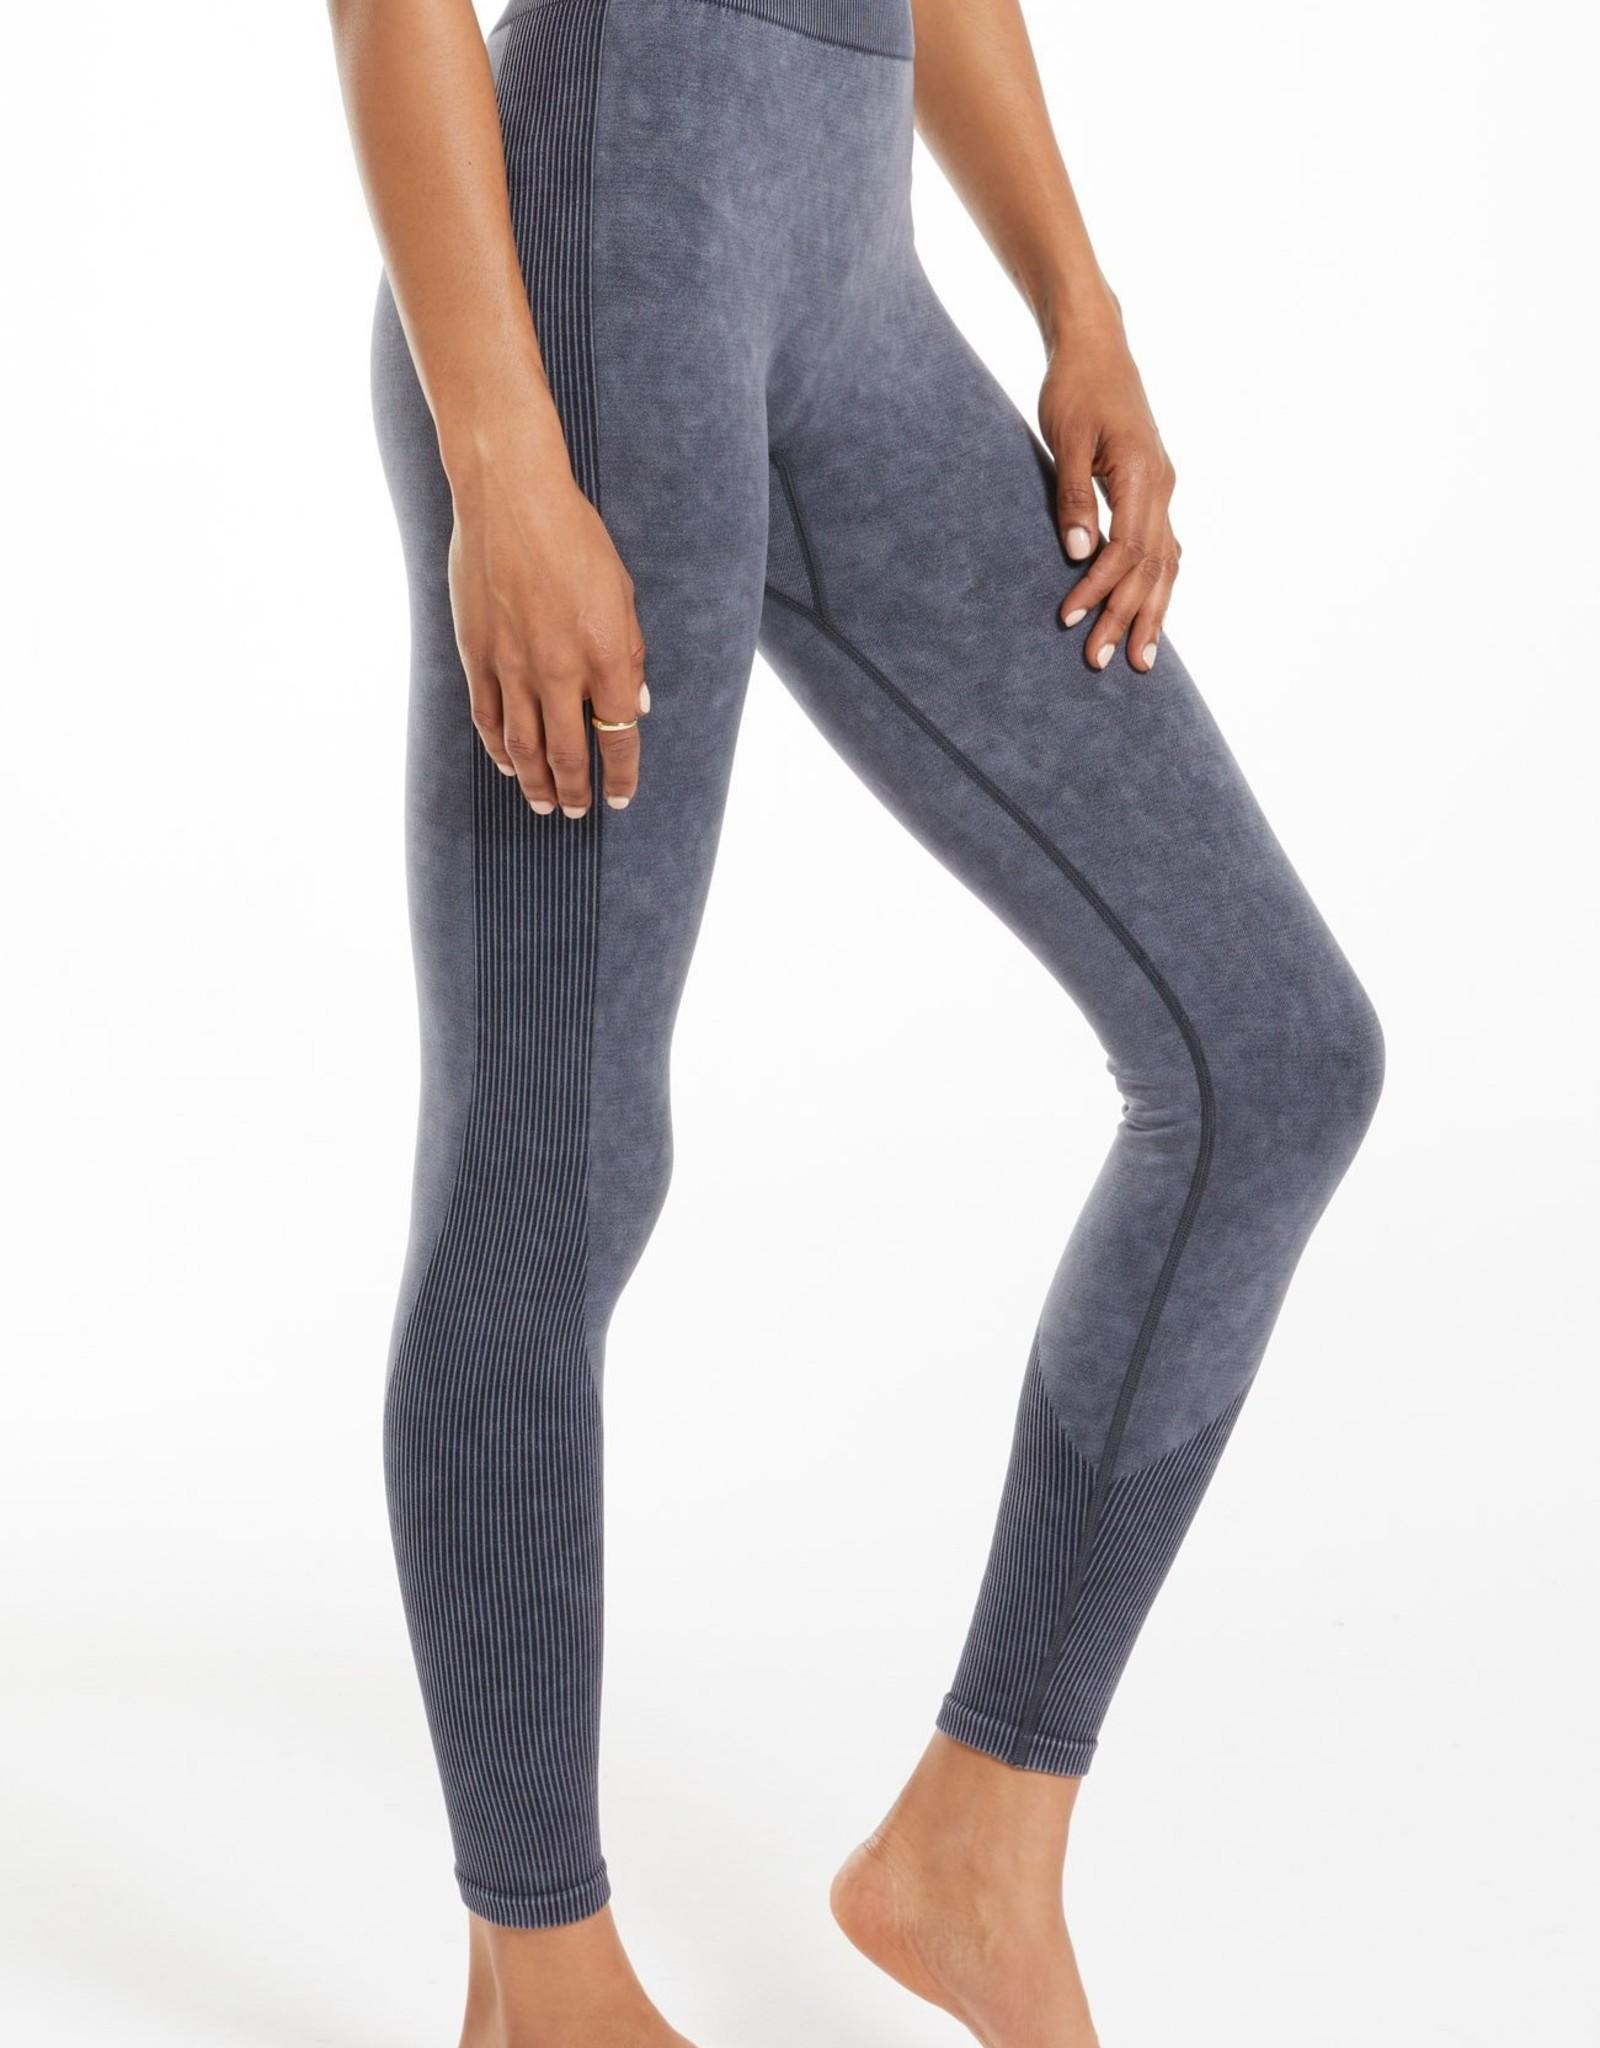 Z Supply Walk It Out Seamless Legging